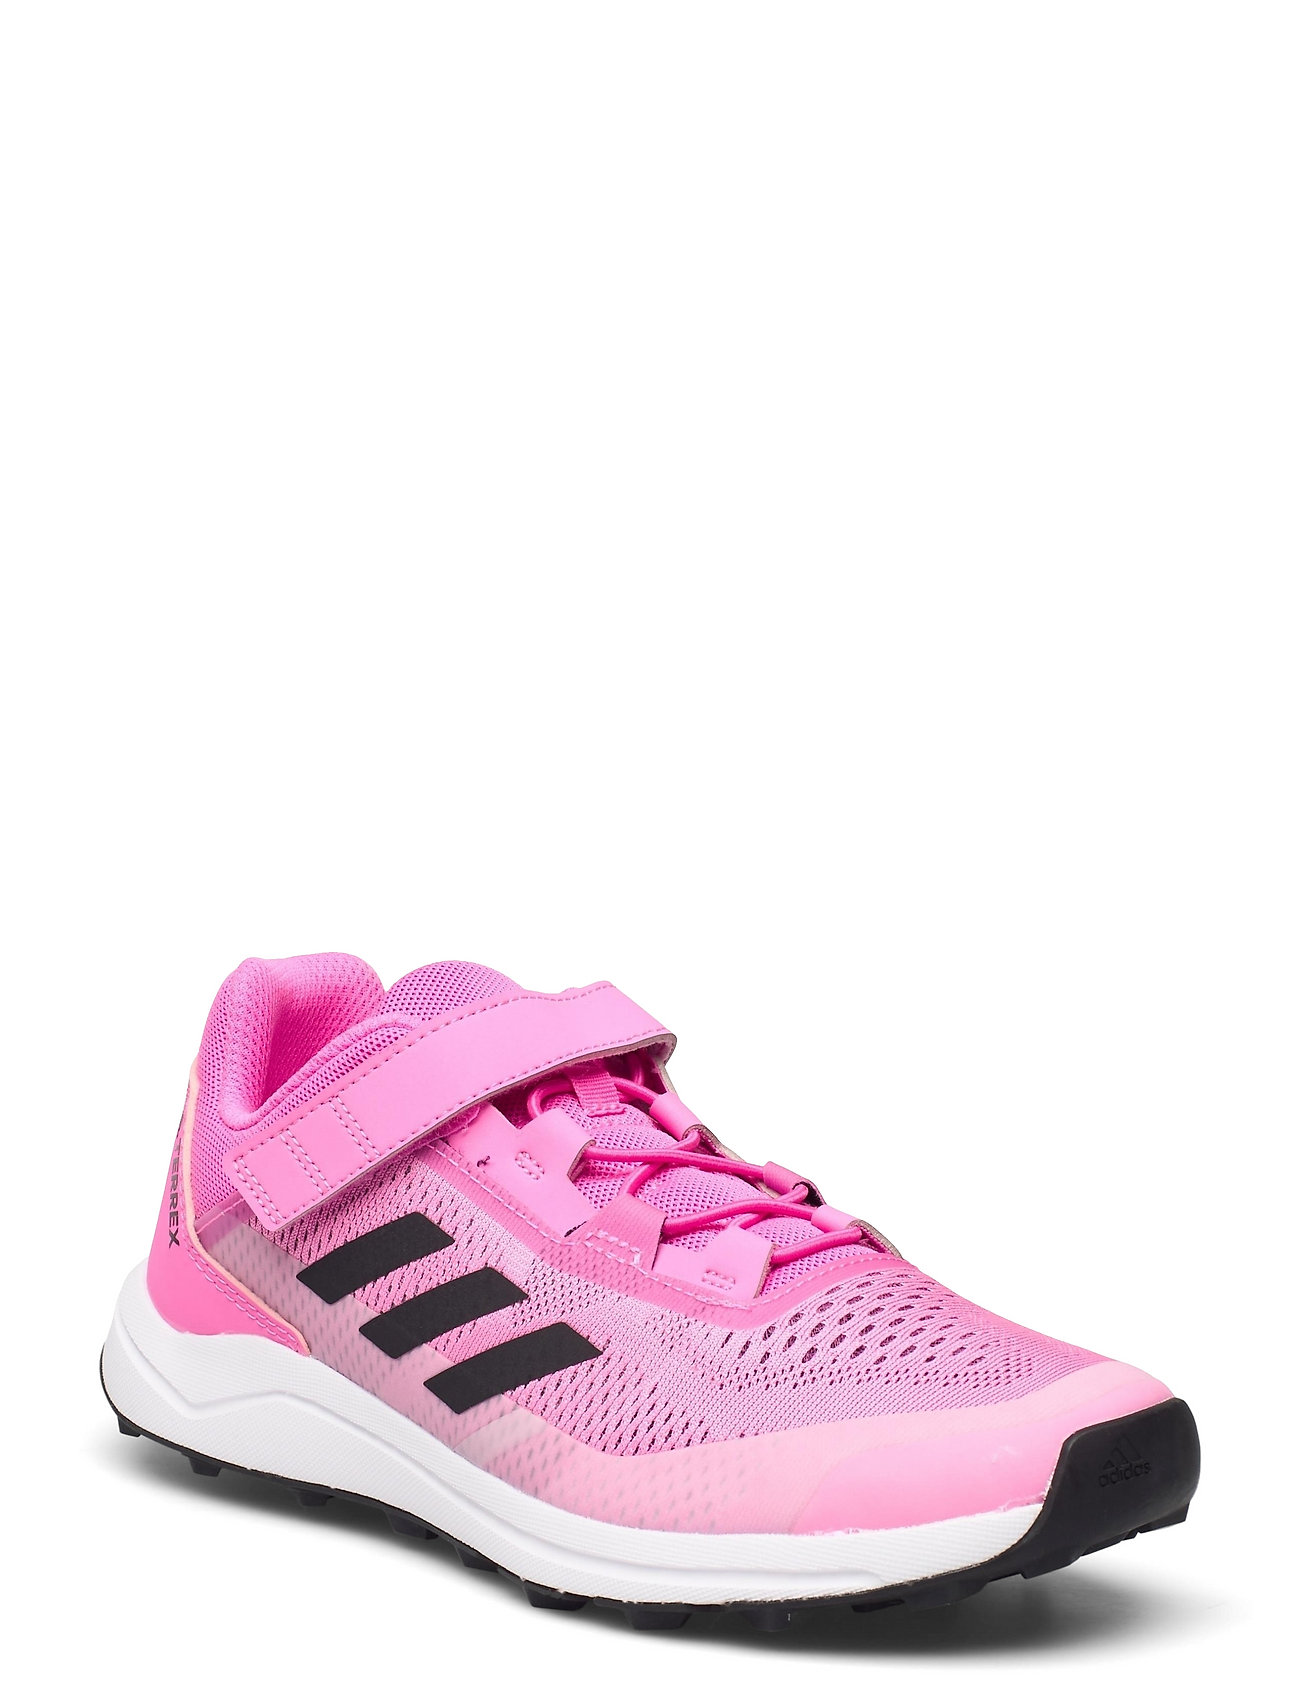 Terrex Agravic Flow Primegreen Trail-Running Shoes Sports Shoes Running/training Shoes Lyserød Adidas Performance